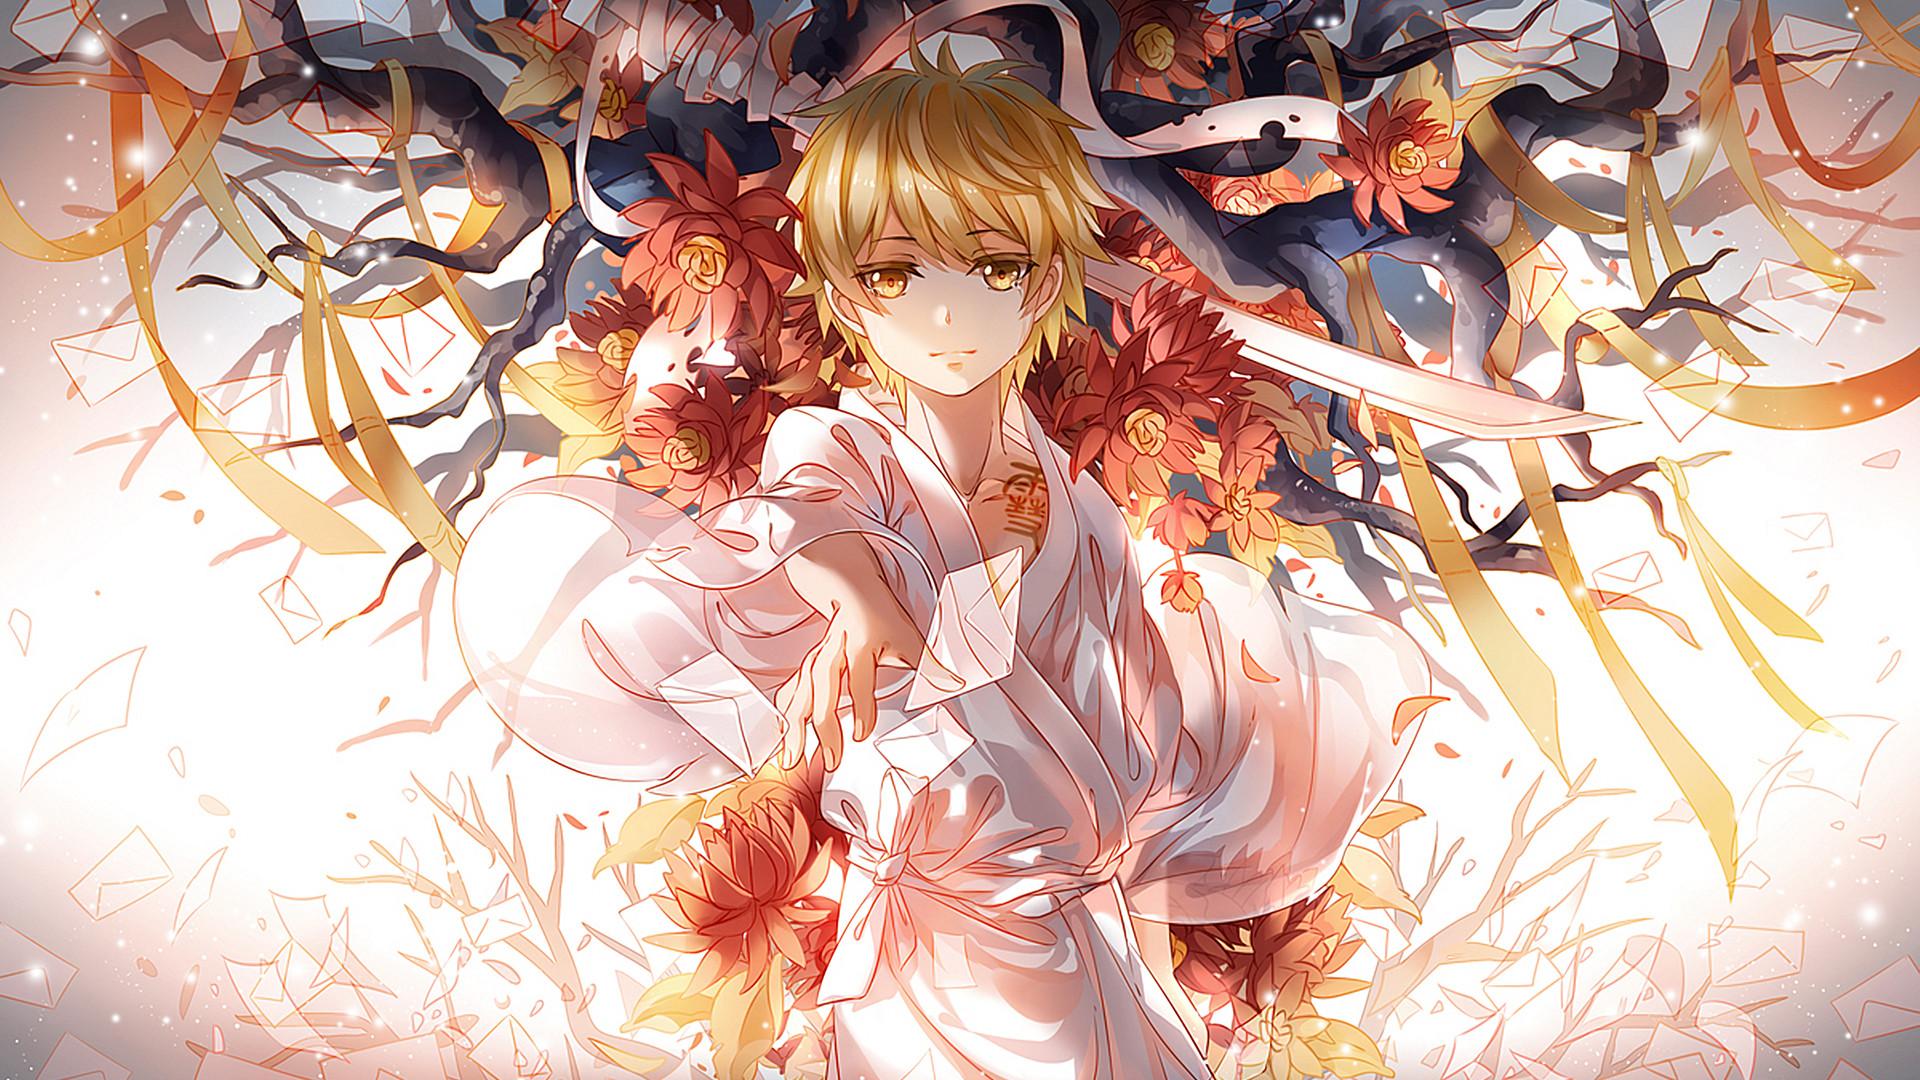 Anime – Noragami Yukine (Noragami) Wallpaper